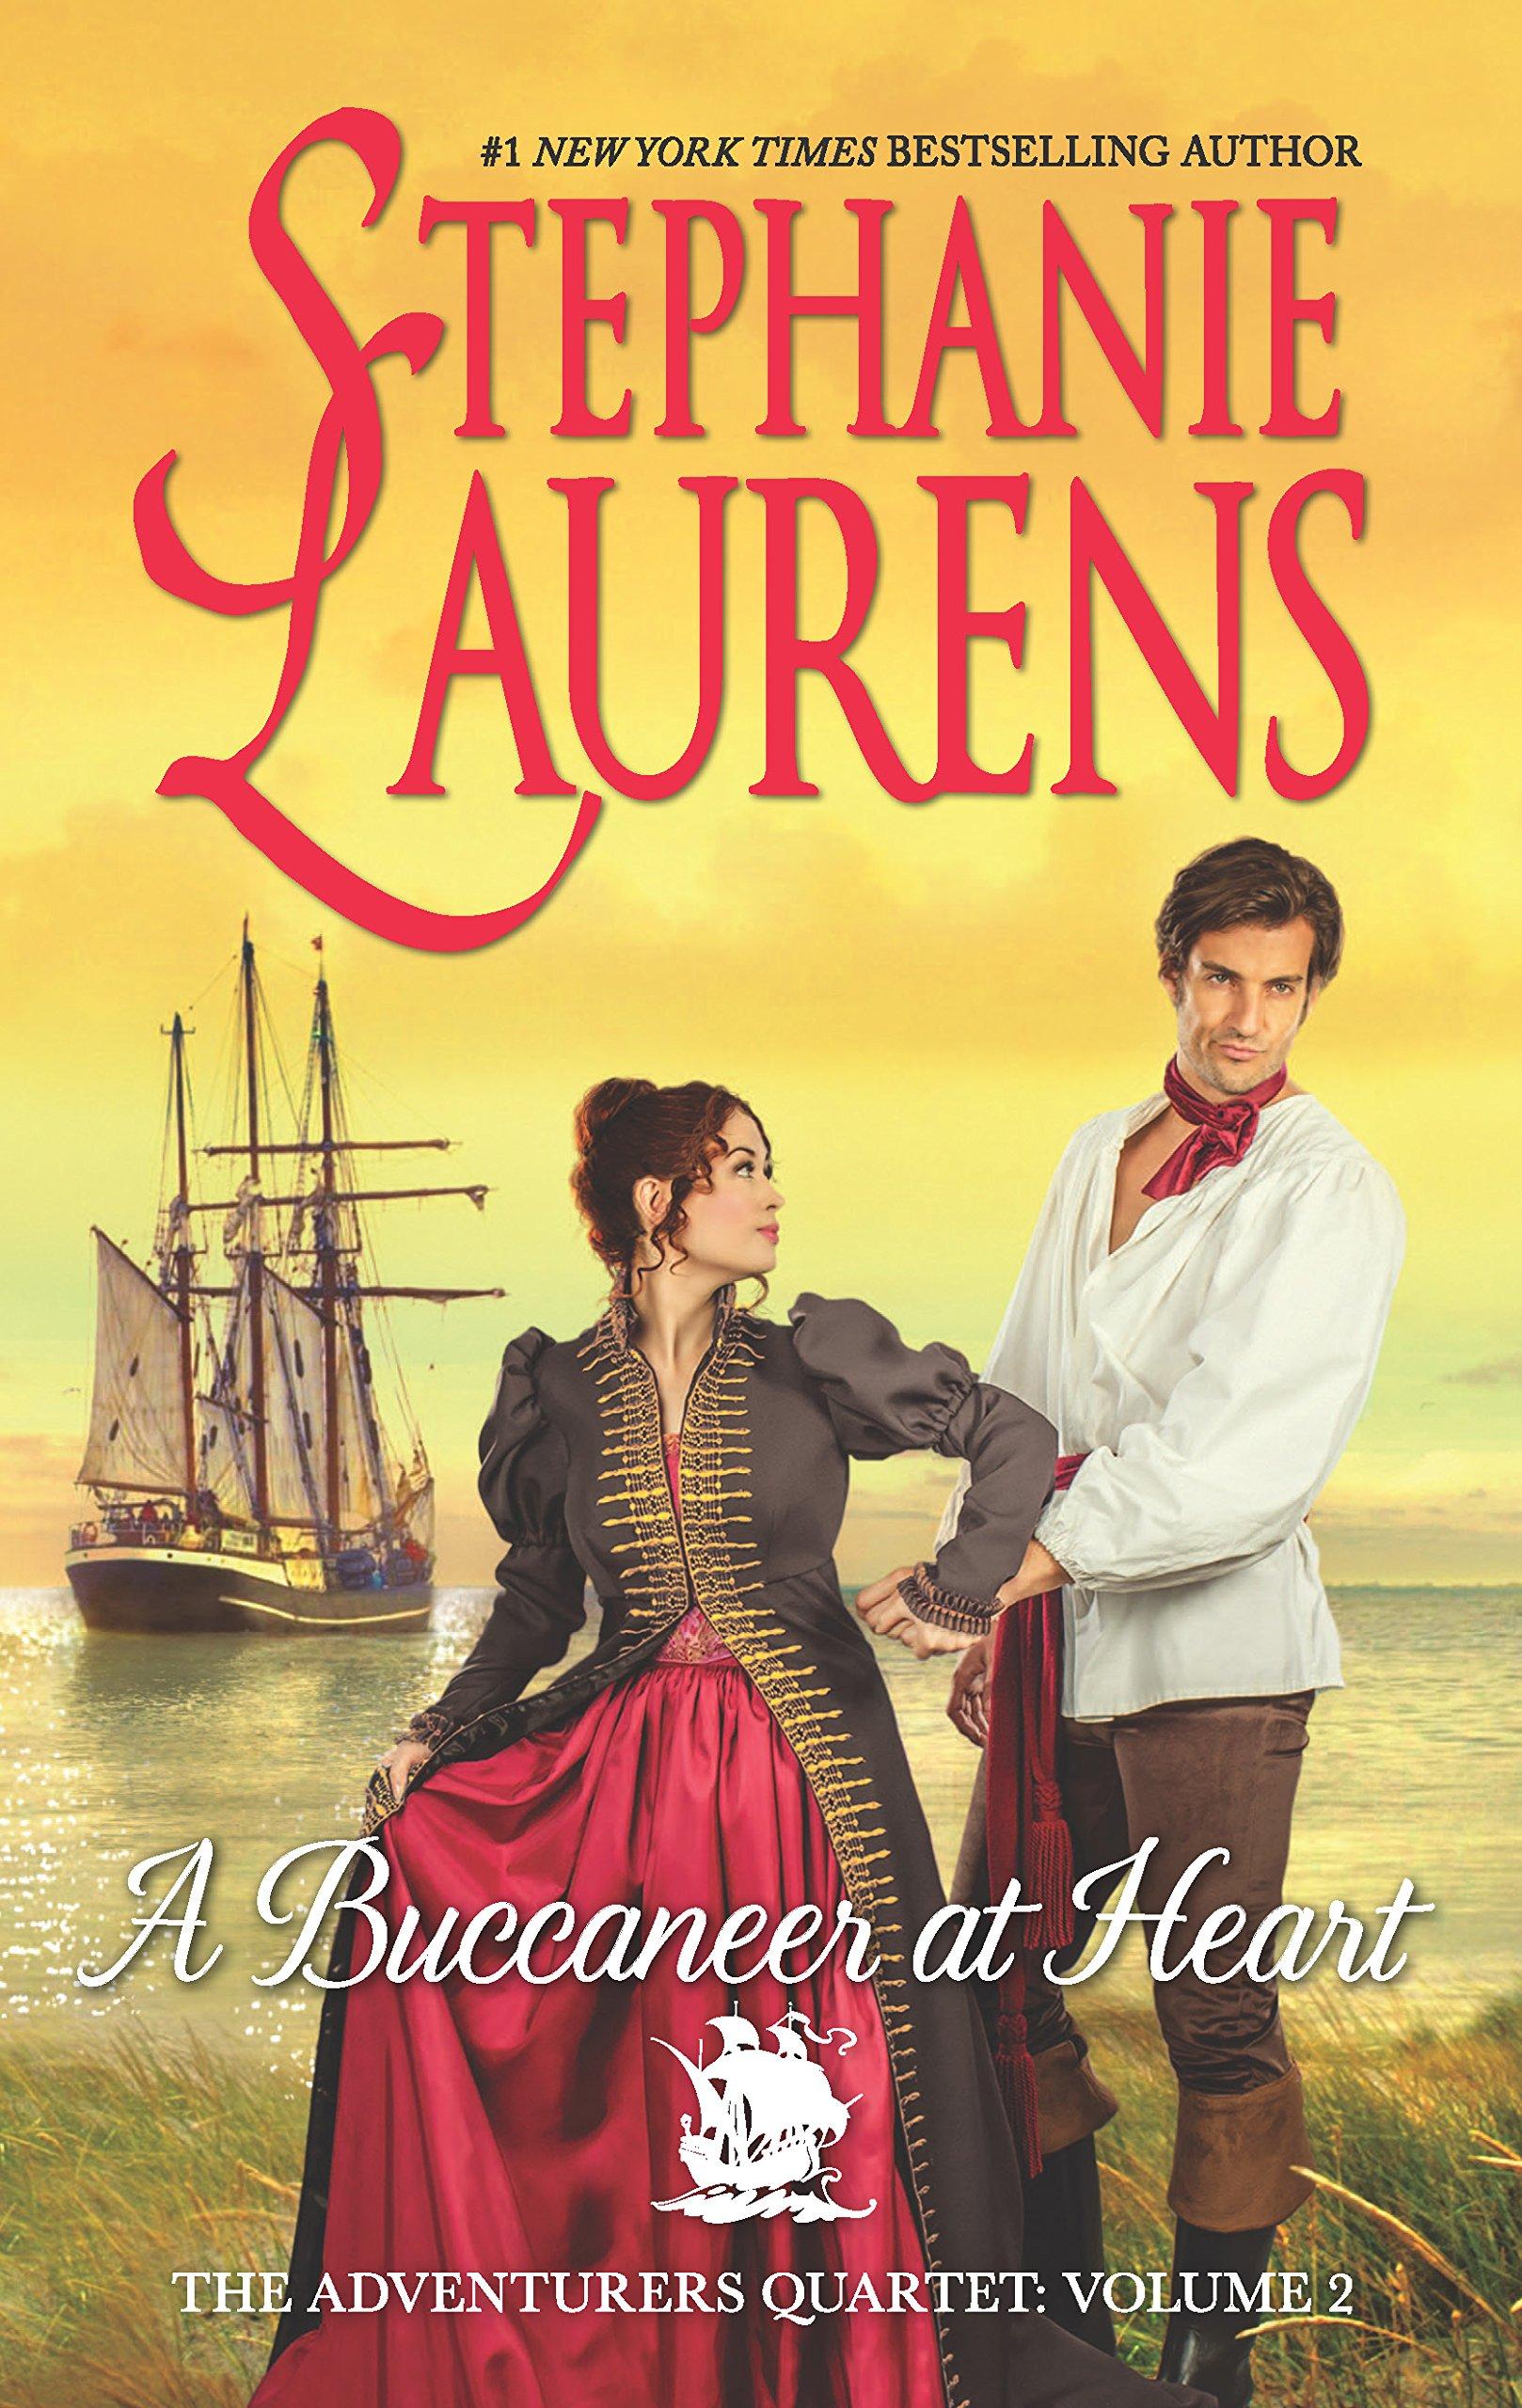 A Buccaneer at Heart (The Adventurers Quartet): Stephanie Laurens:  9780778318781: Amazon.com: Books